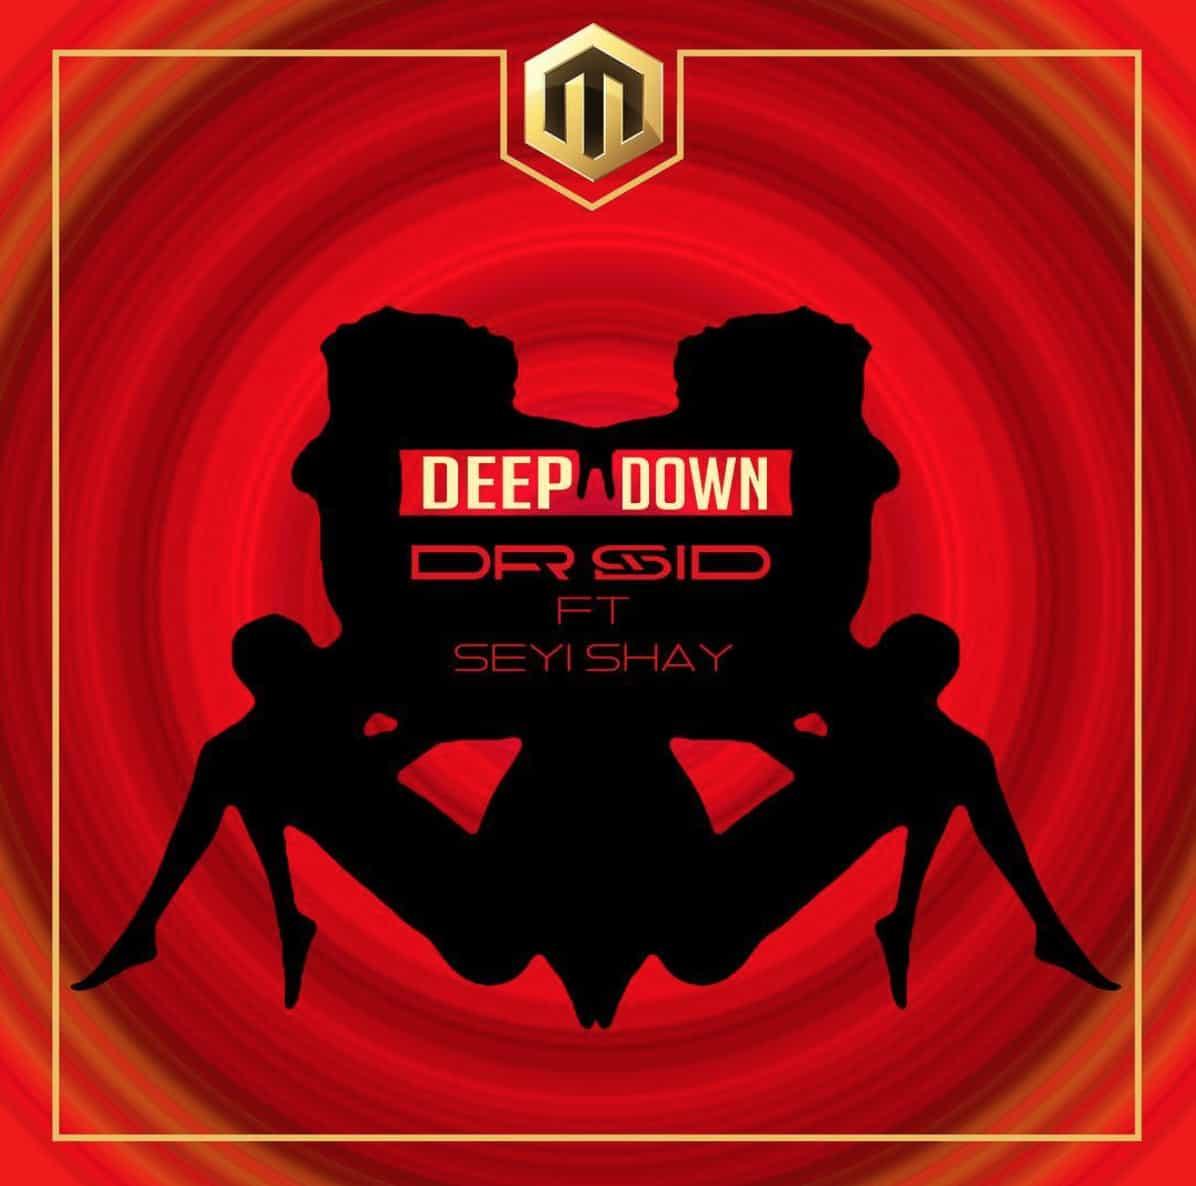 Dr. SidDeep Down ft. Seyi Shay